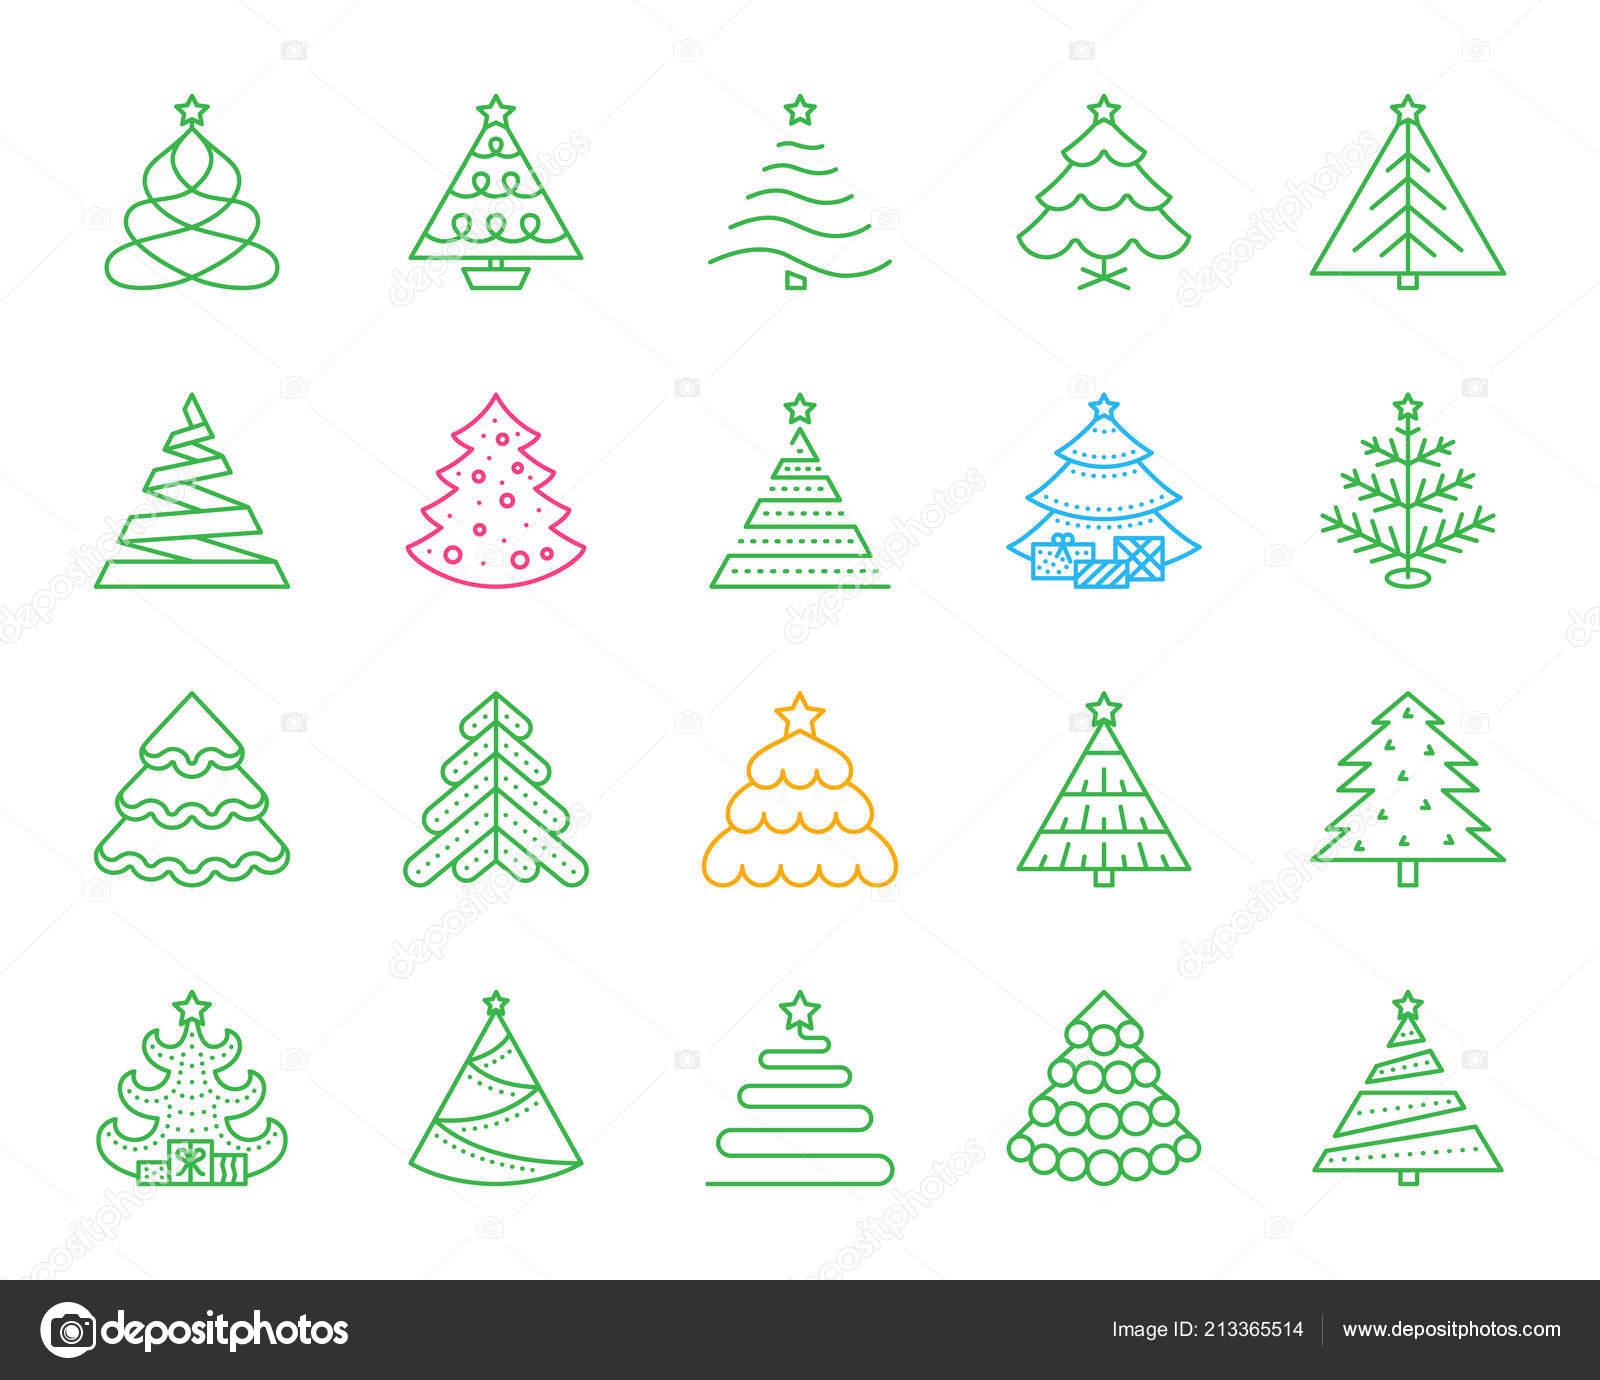 Christmas Tree Icons.Christmas Tree Simple Color Line Icons Vector Set Stock